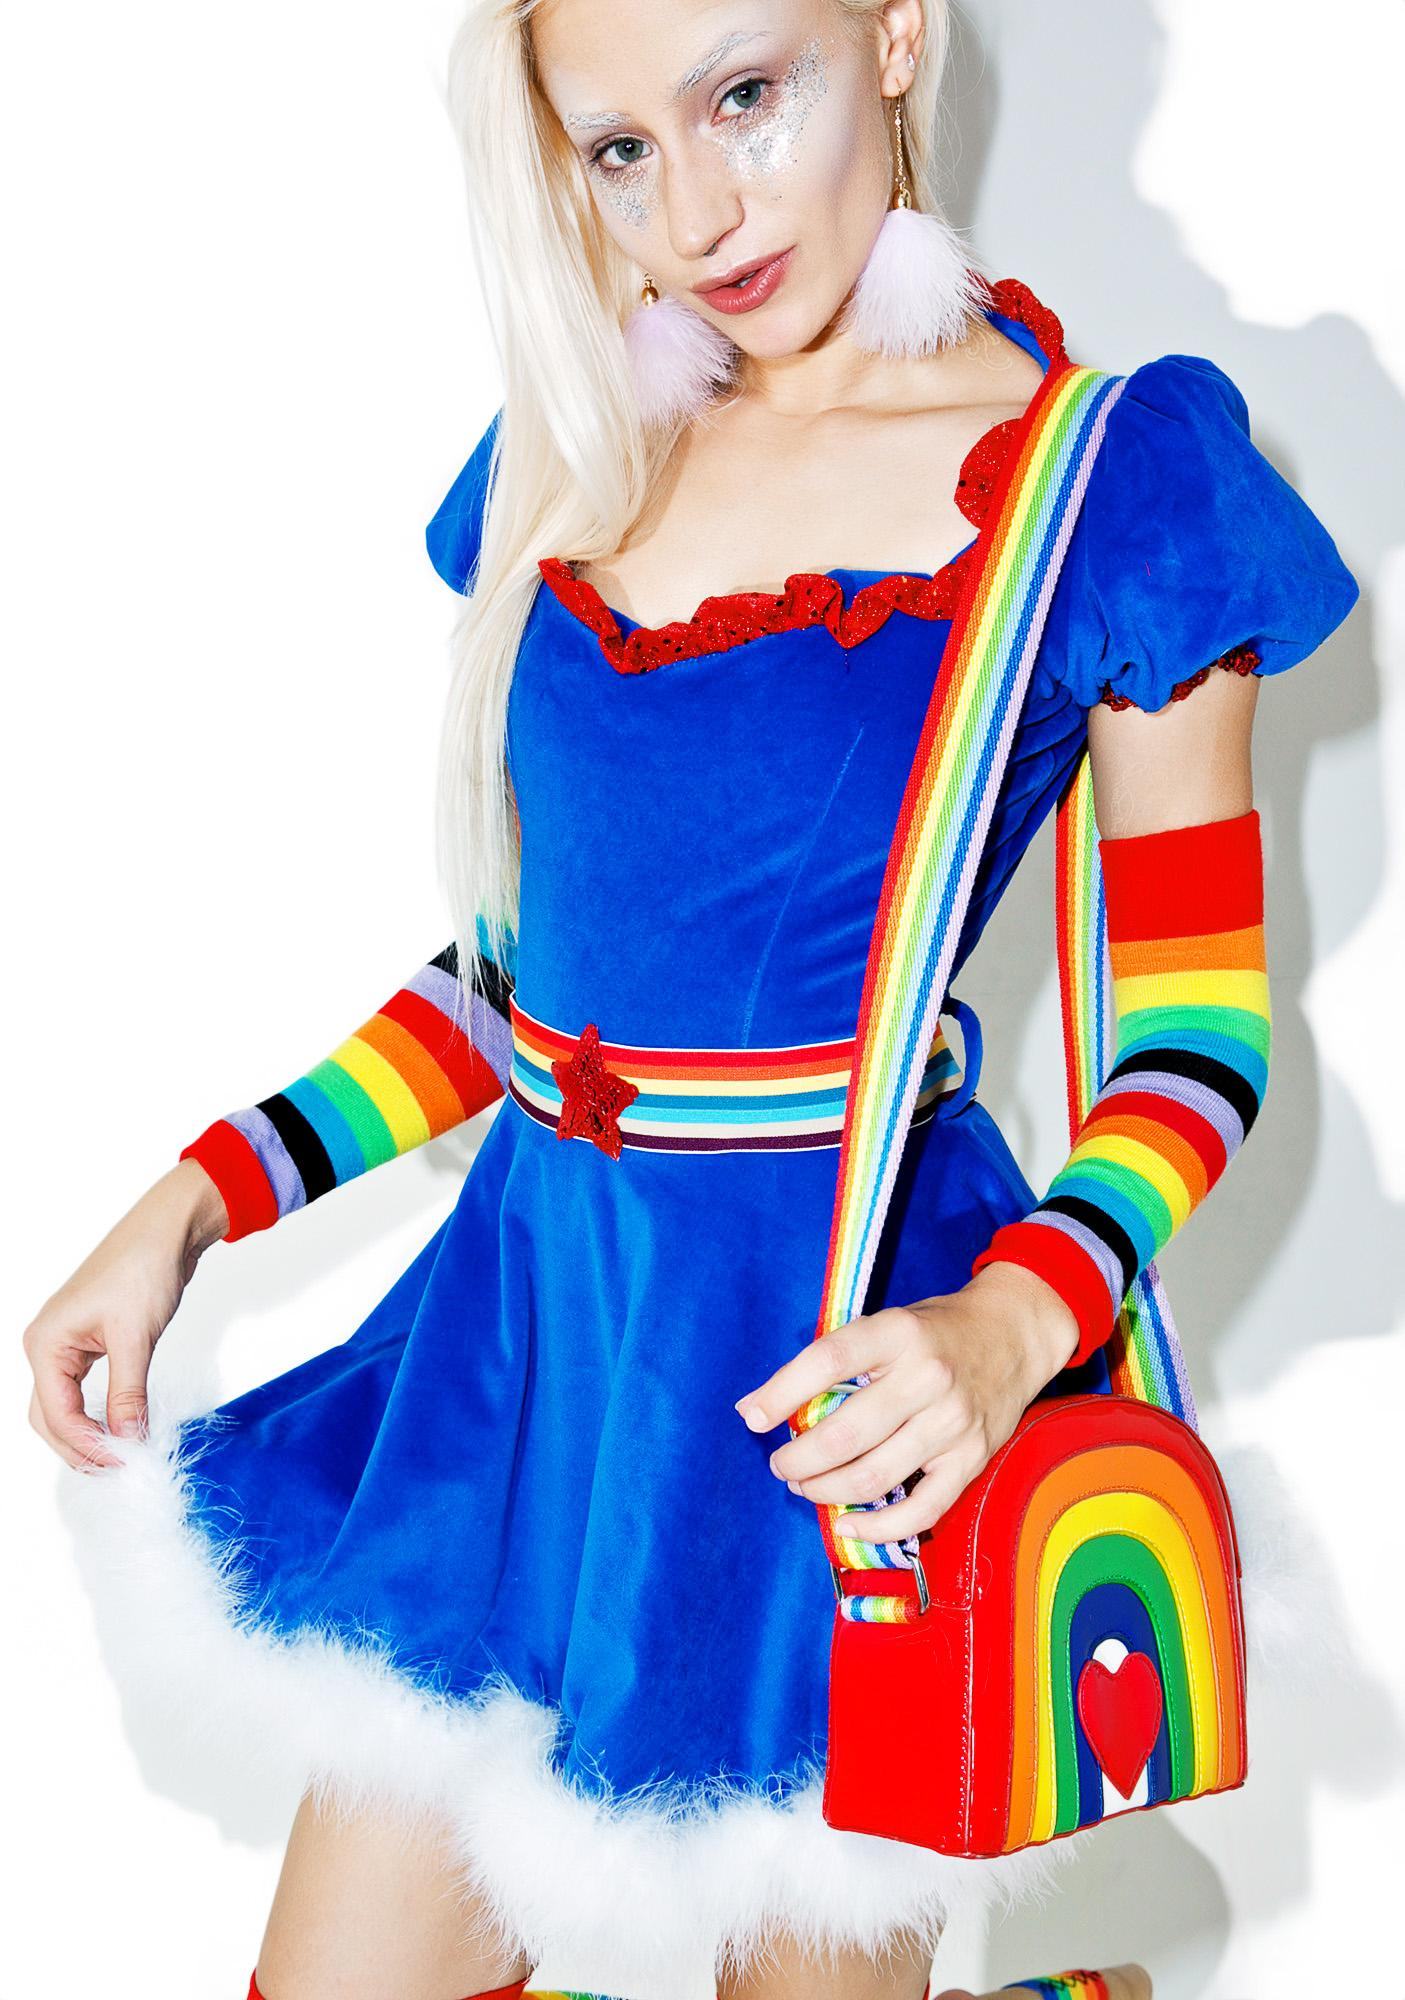 Amazoncom: rainbow brite costume: Clothing, Shoes & Jewelry